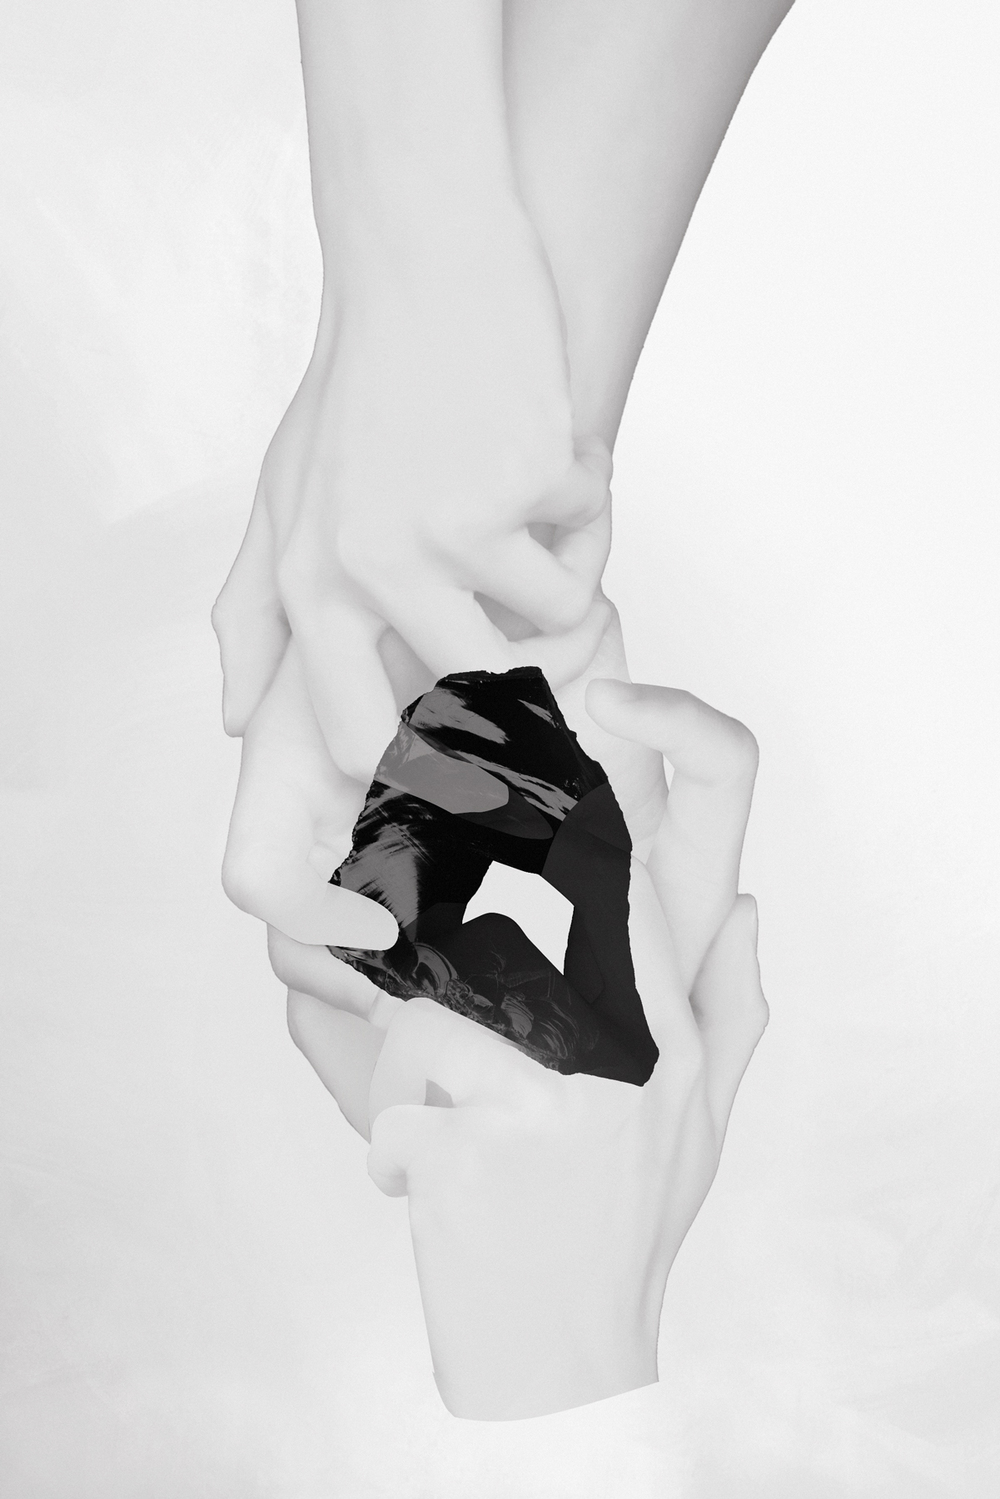 Obsidian Hands Lauren Indovina 2013